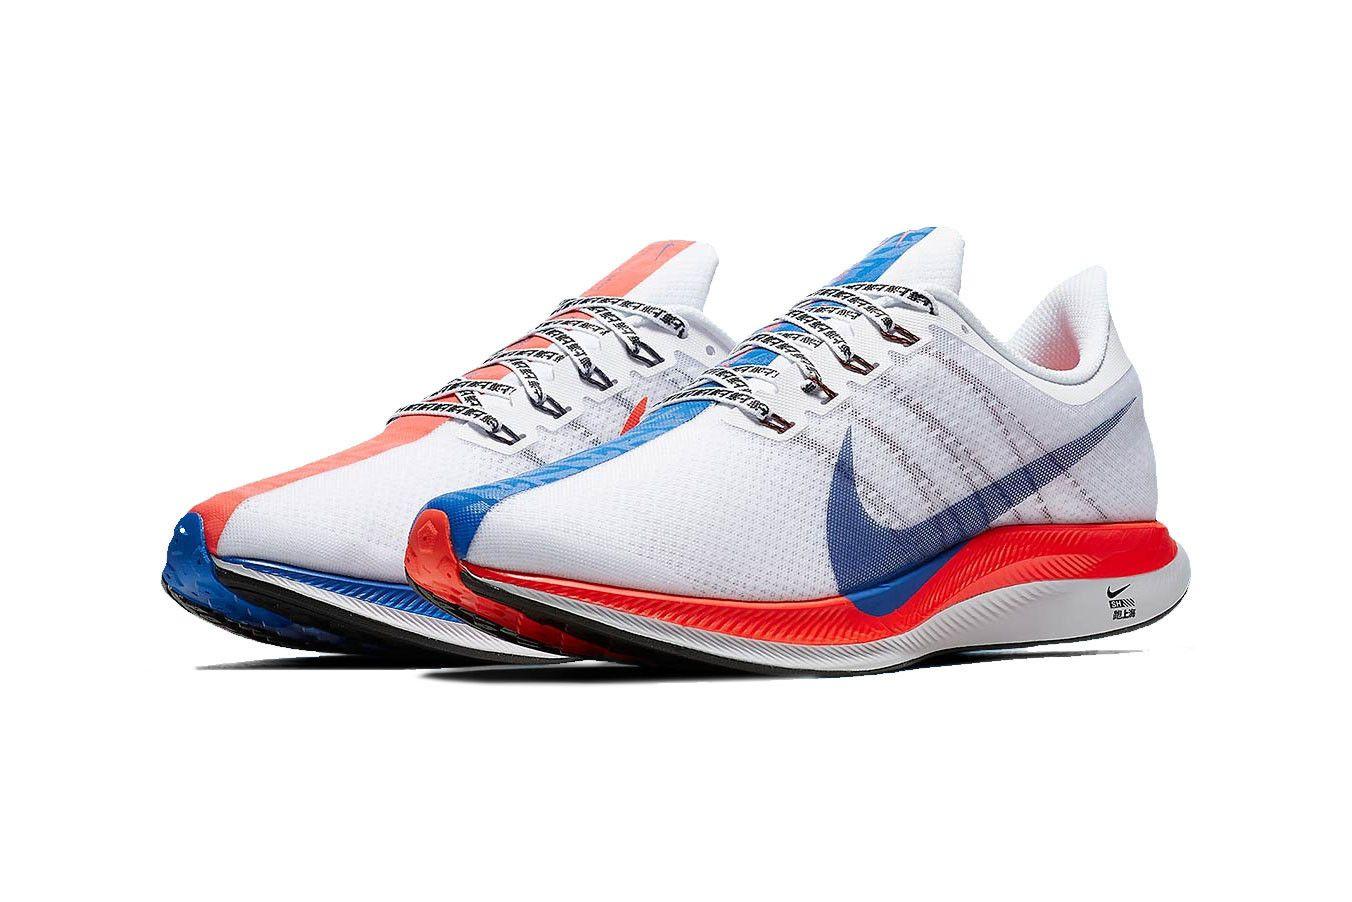 6747daba3612 Nike Zoom Pegasus 35 Turbo Shanghai Rebels Pack Official Look Marathon  White Red Blue